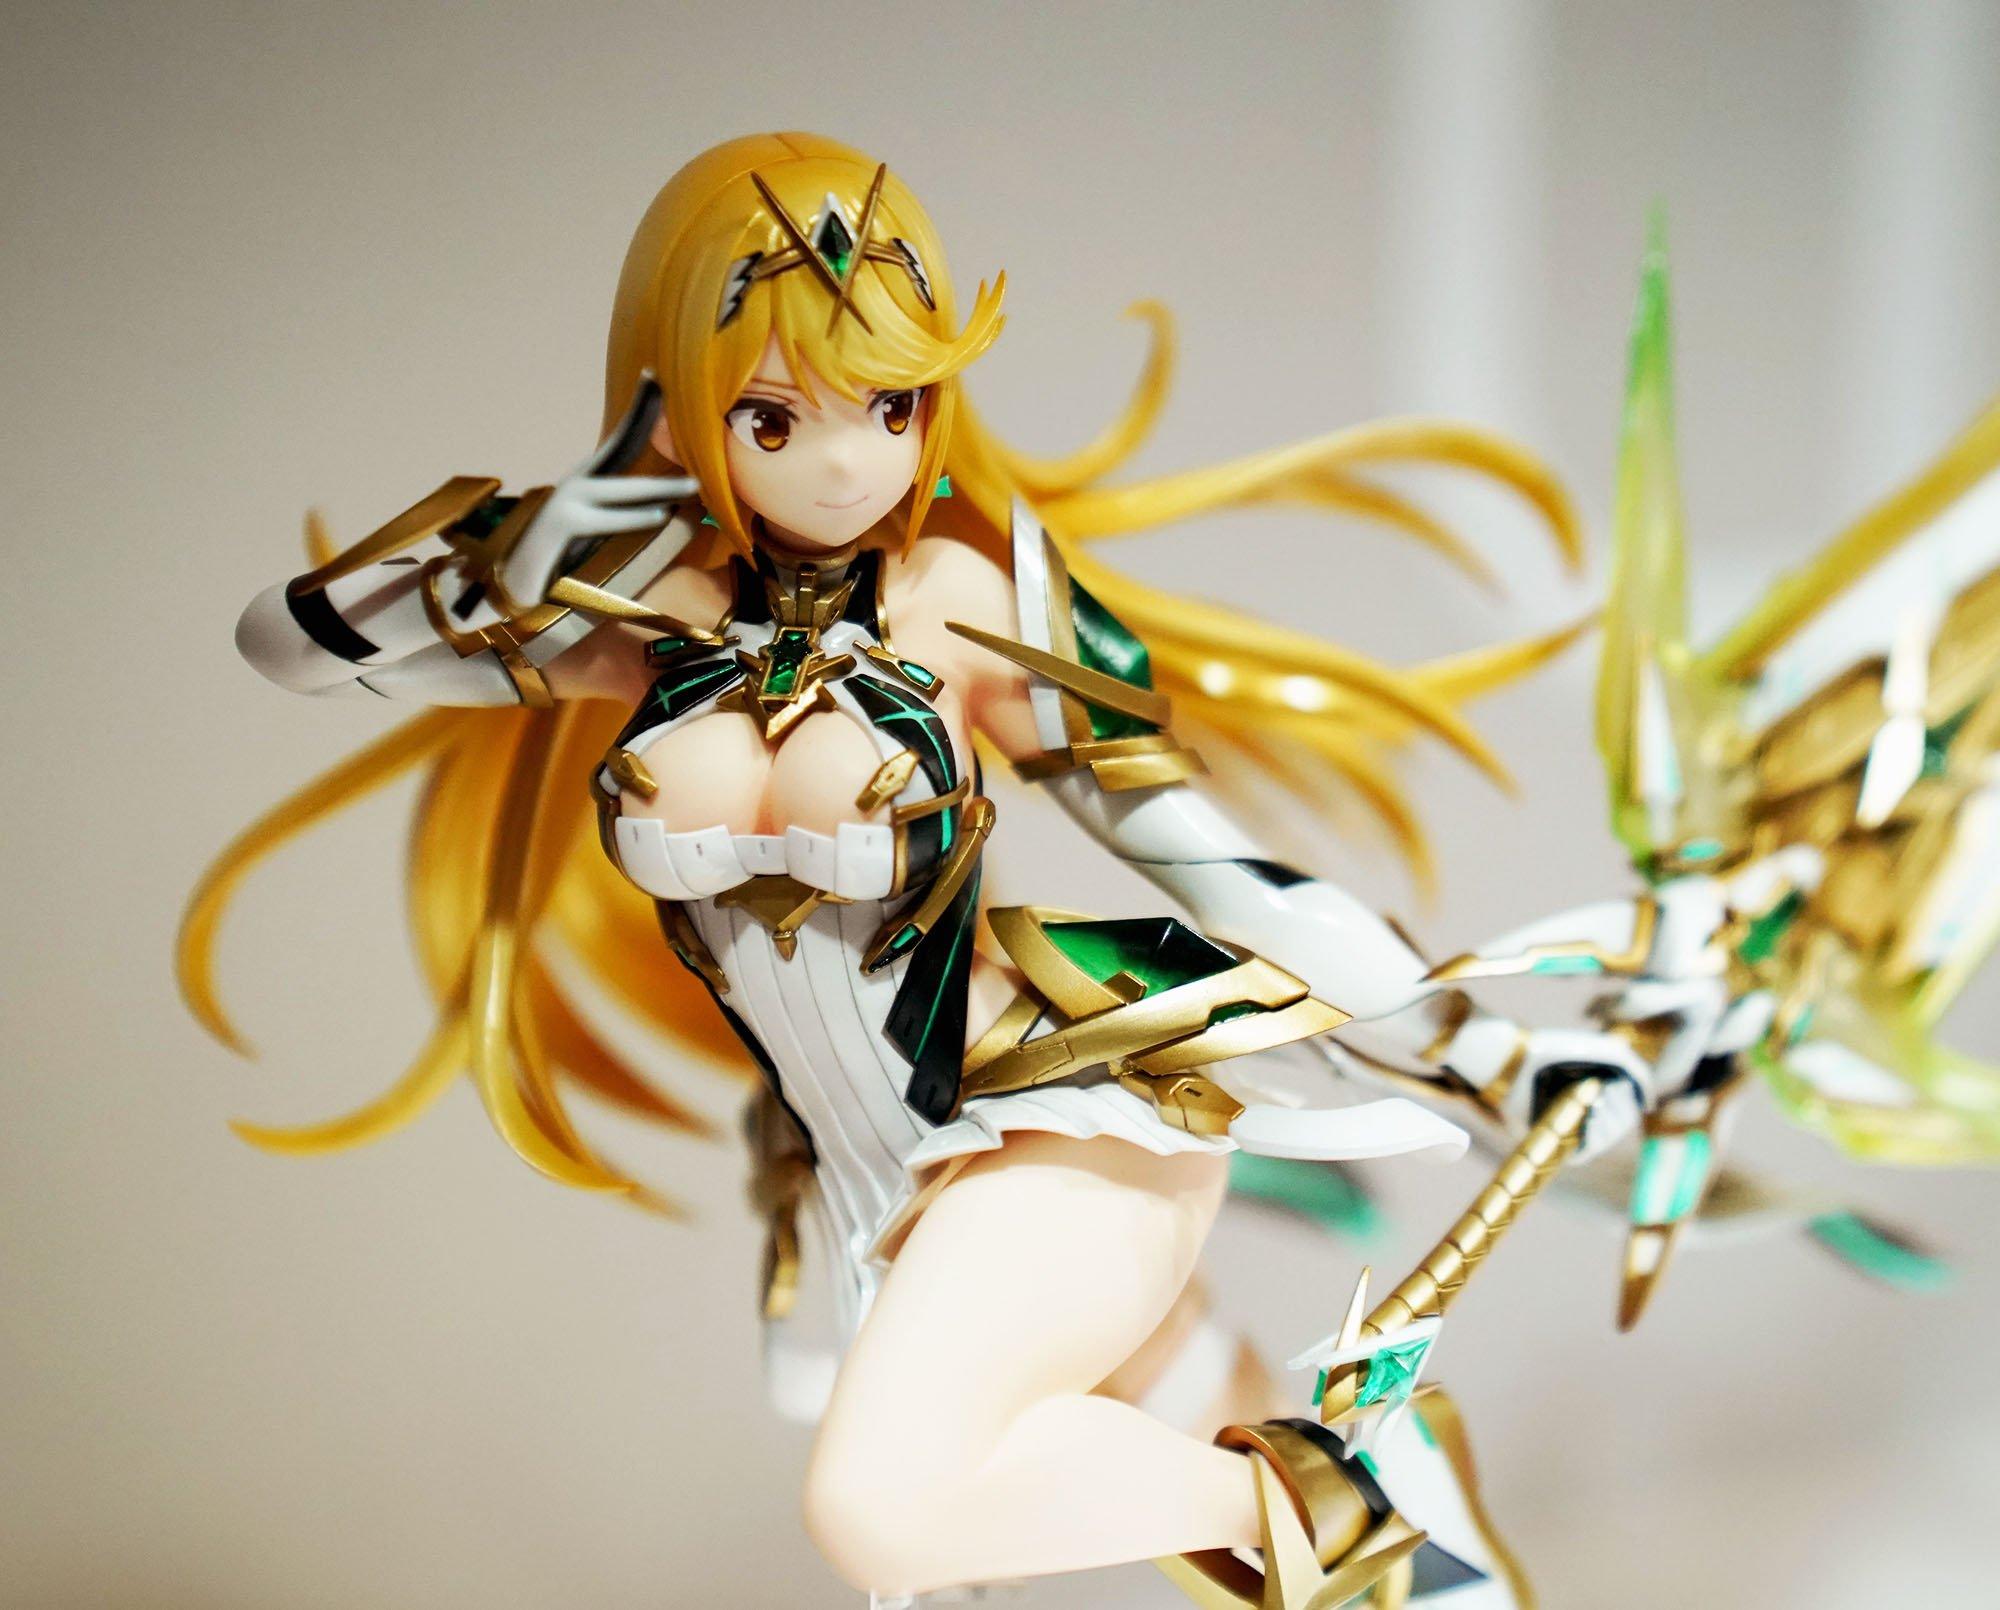 La Figurine Xenoblade Chronicles 2 Mythra s'annonce superbe !